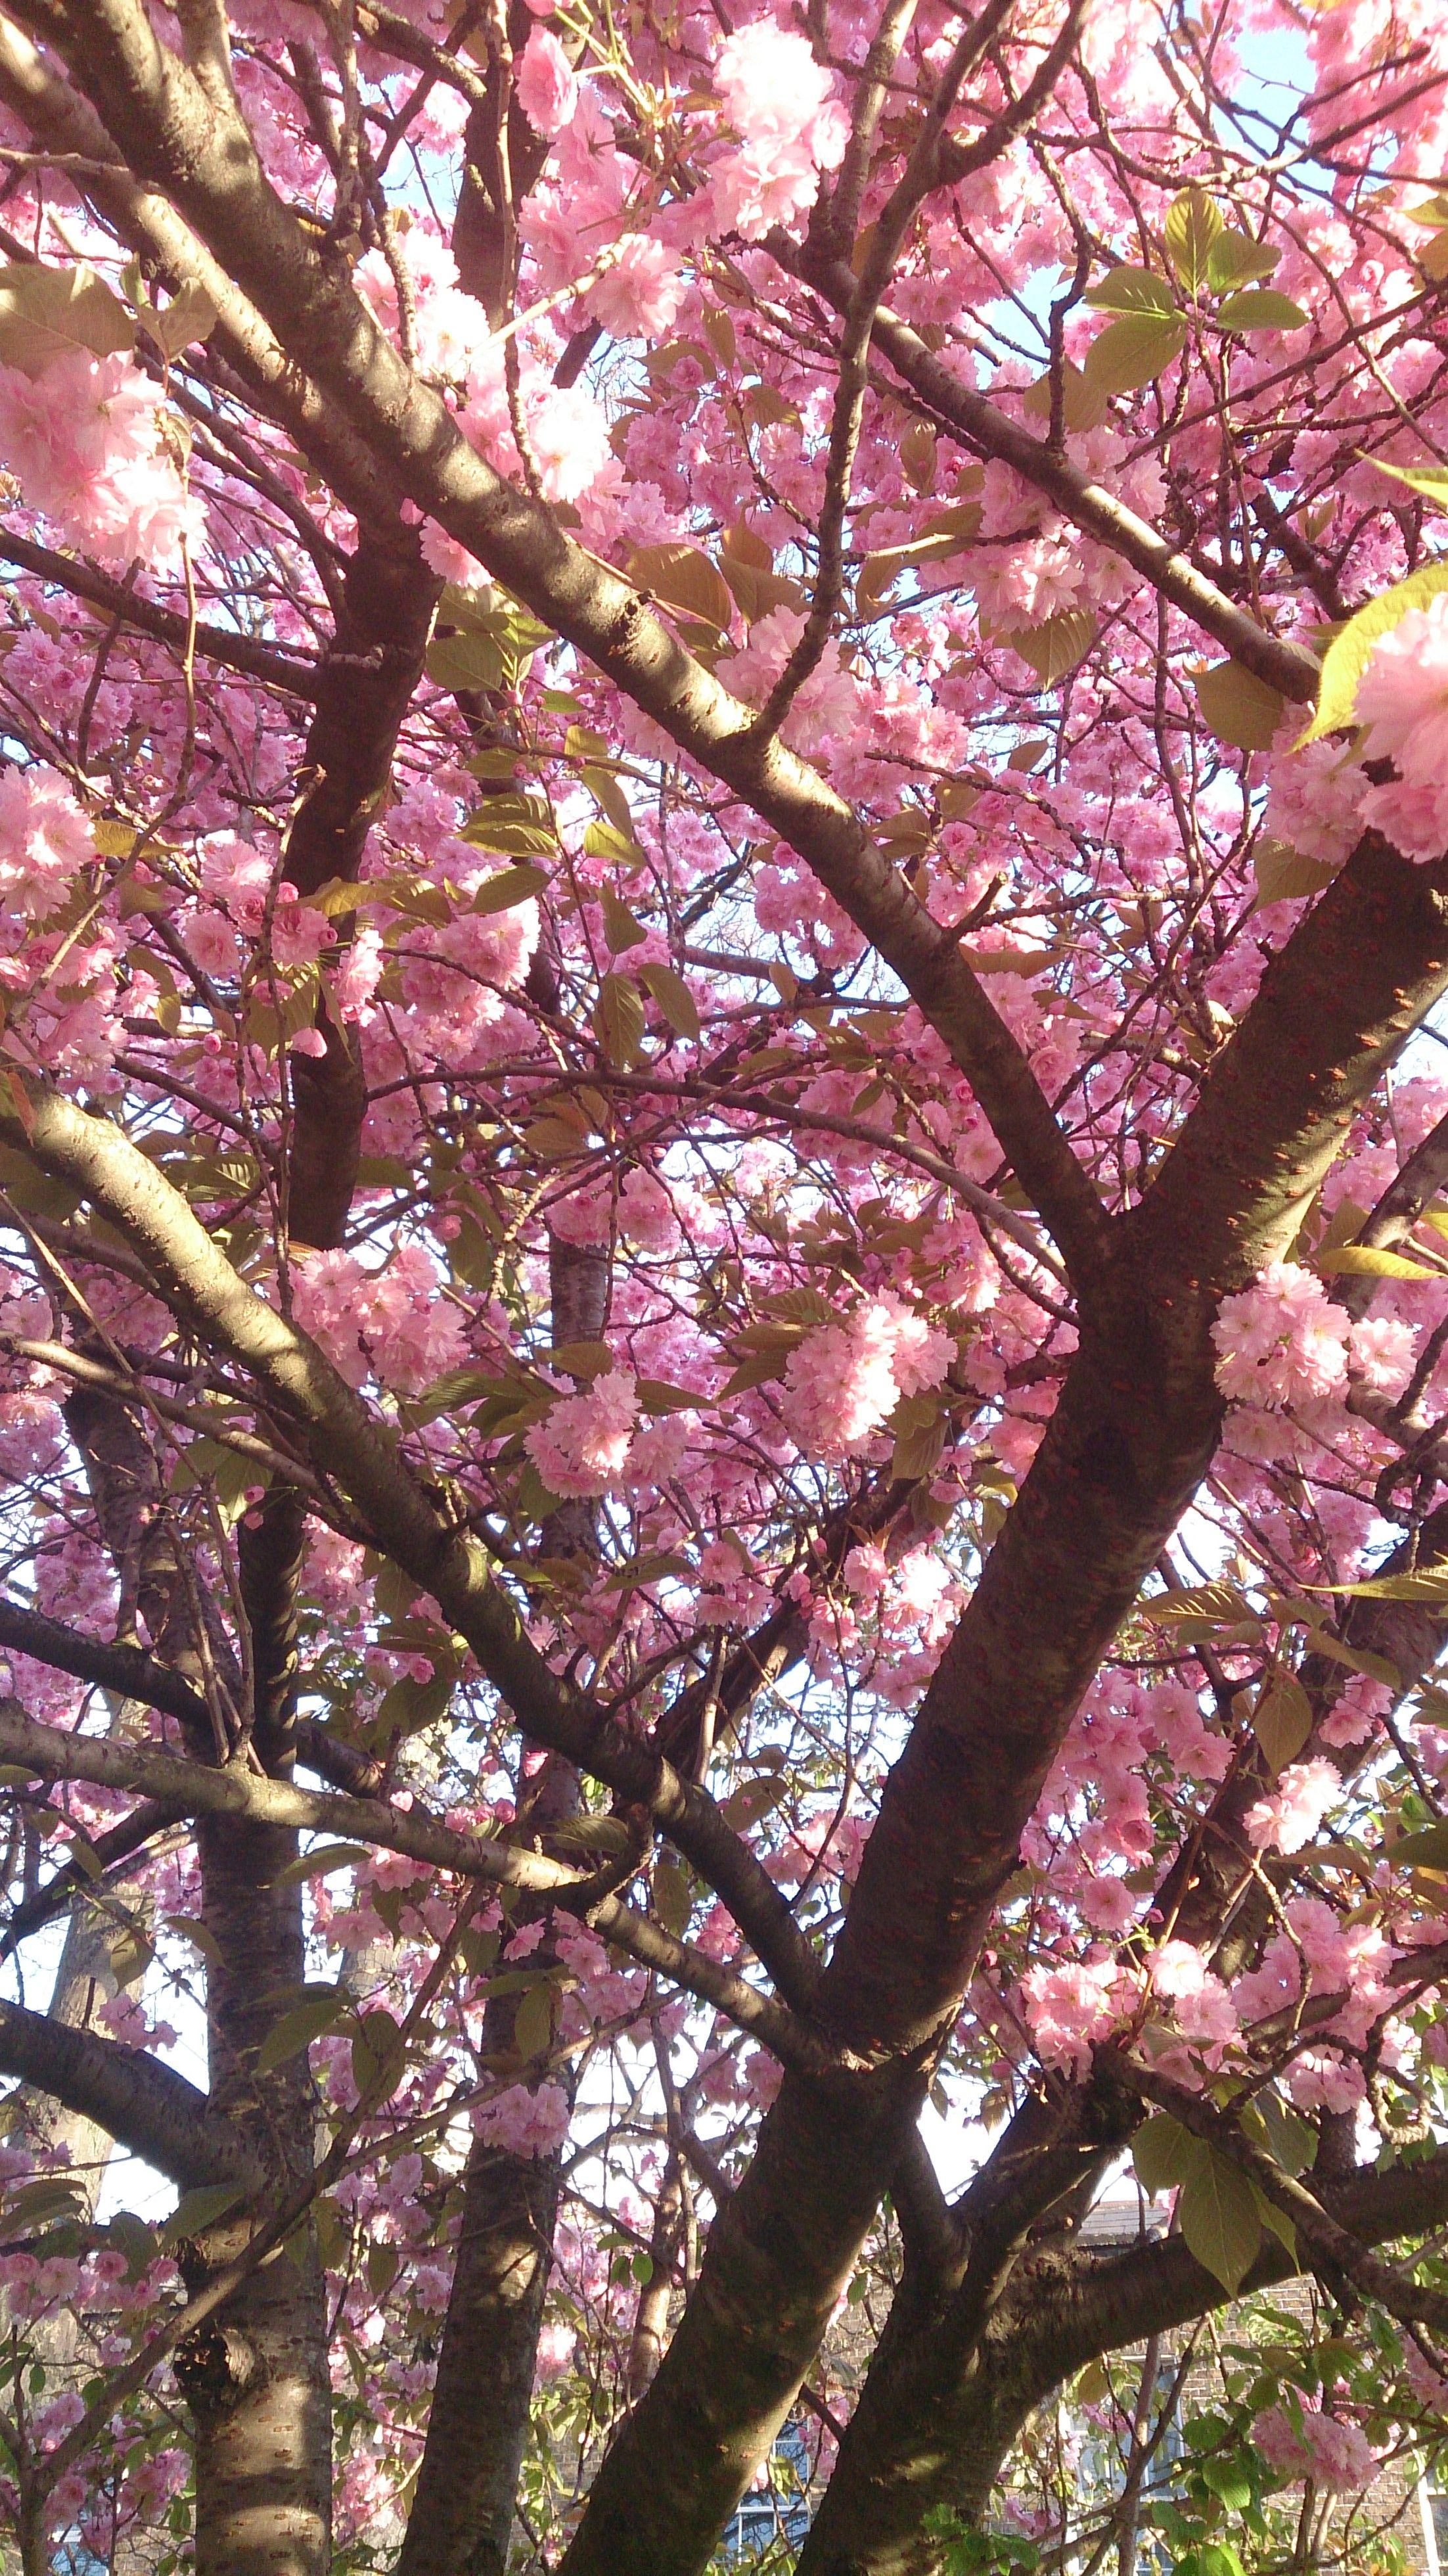 Cherry Blossom Tree Rathmines 19 04 14 Cherry Blossom Tree Blossom Trees Cherry Blossom